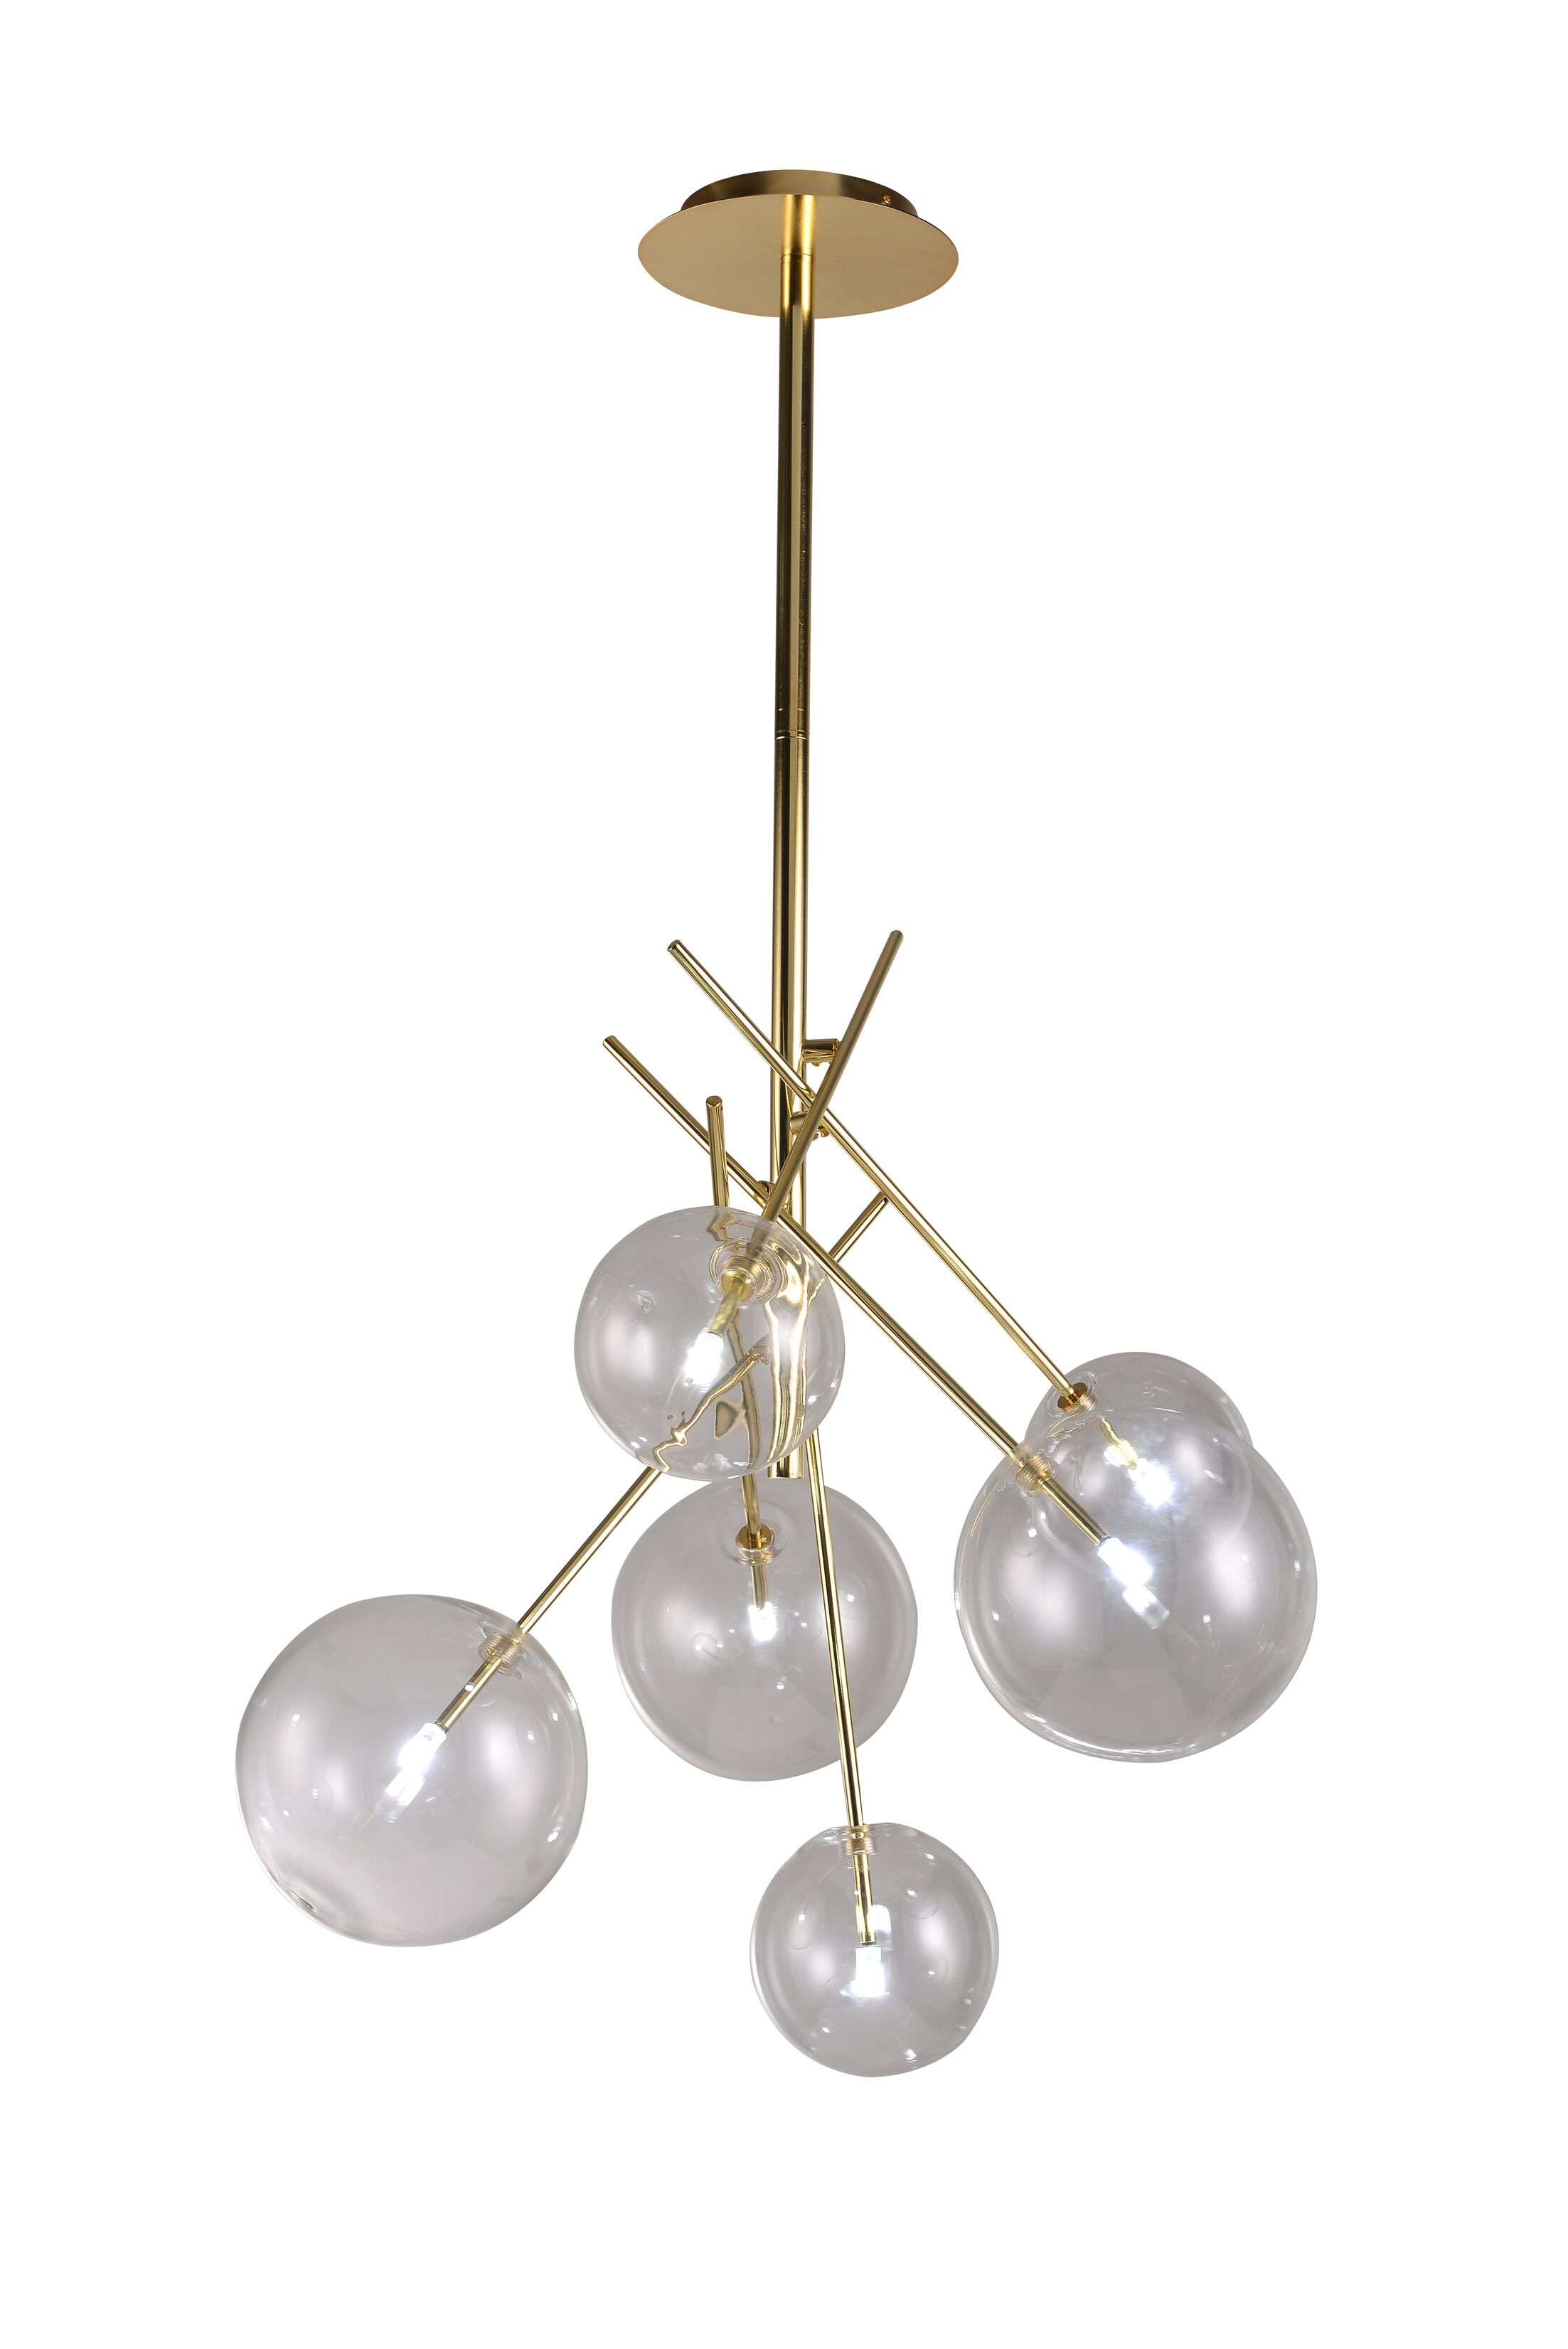 Cheadle 6-Light Sputnik Chandelier